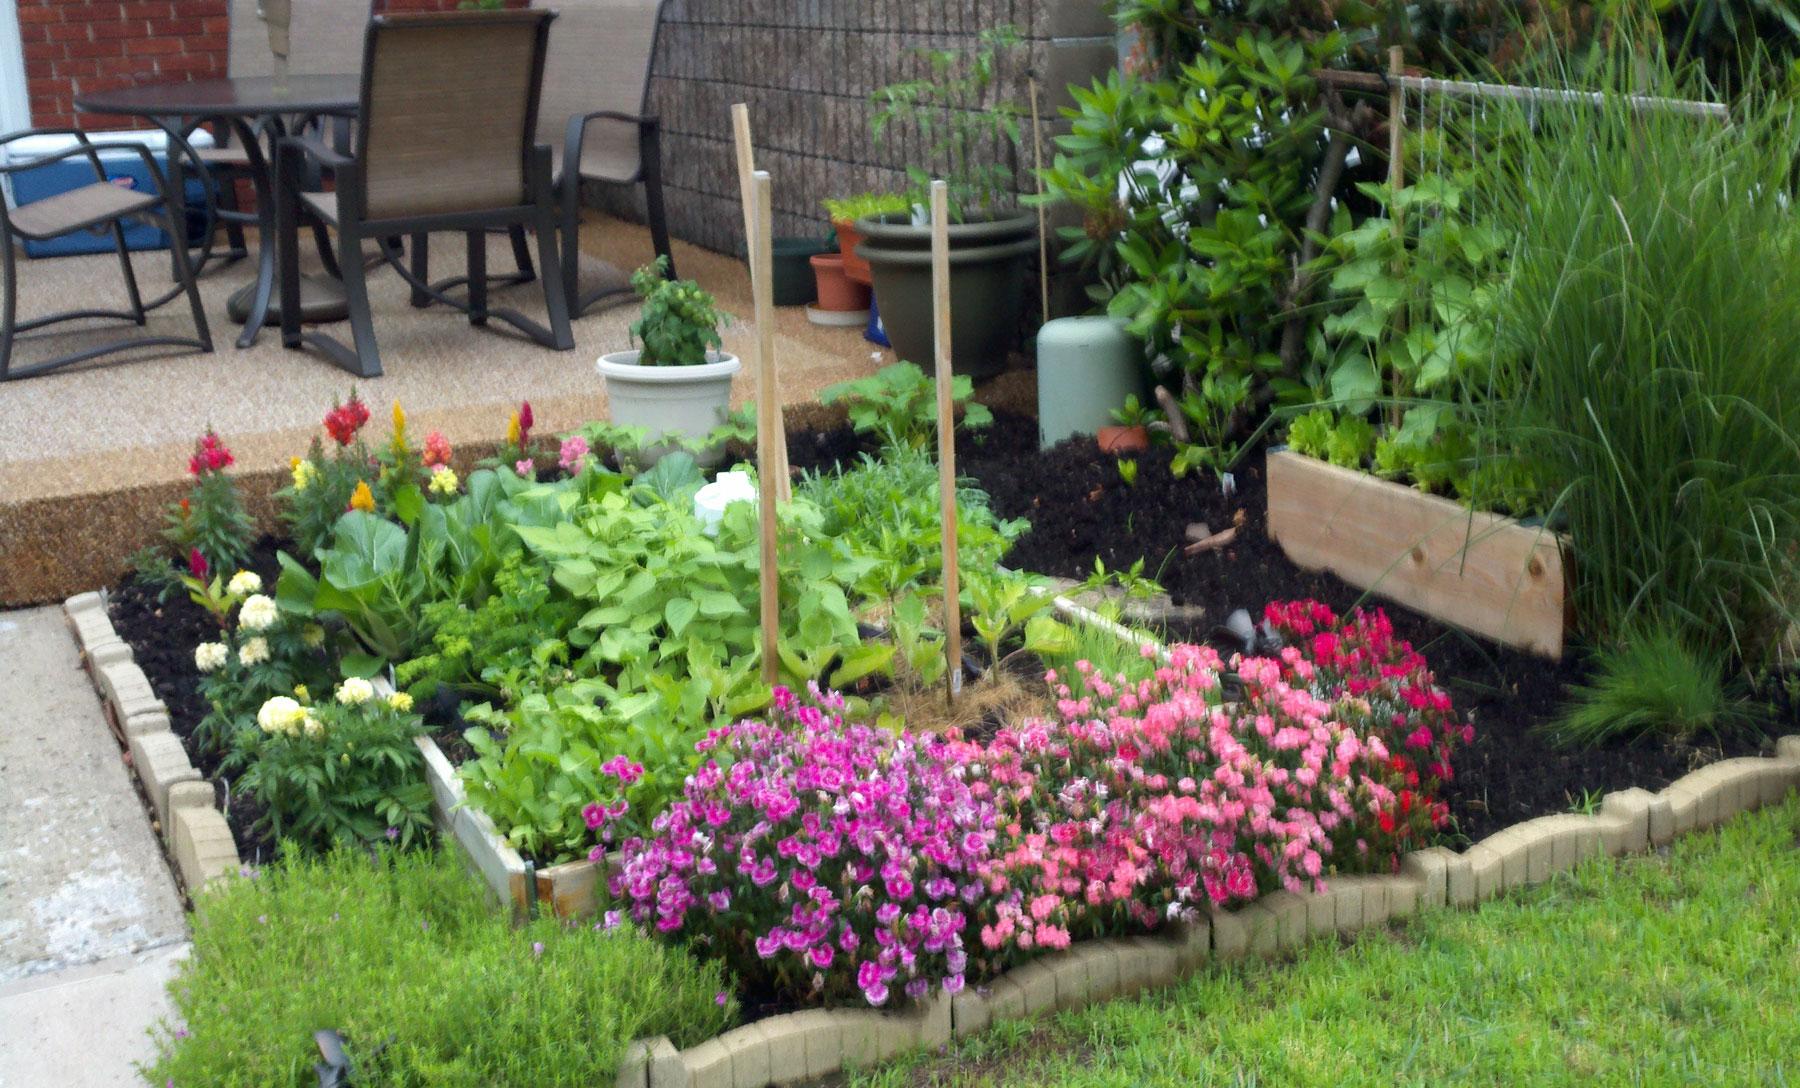 Small easy care garden ideas | Hawk Haven